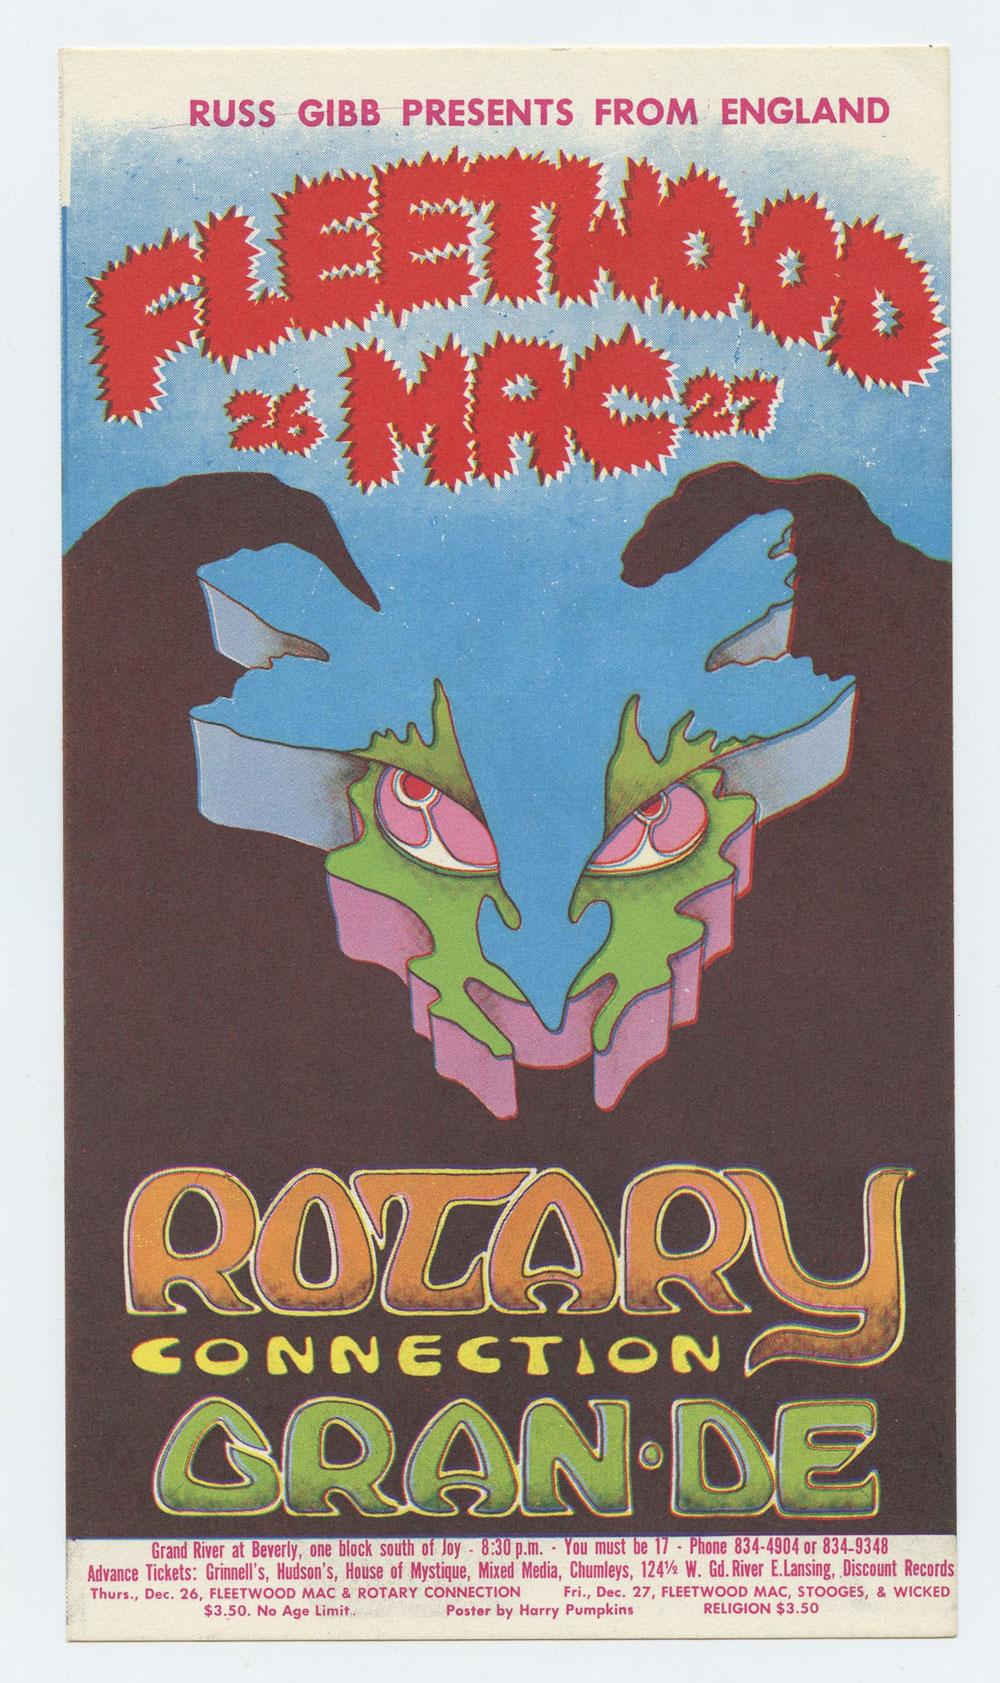 Grande Ballroom 1968 Dec 26 Postcard Fleetwood Mac Rotary Connection